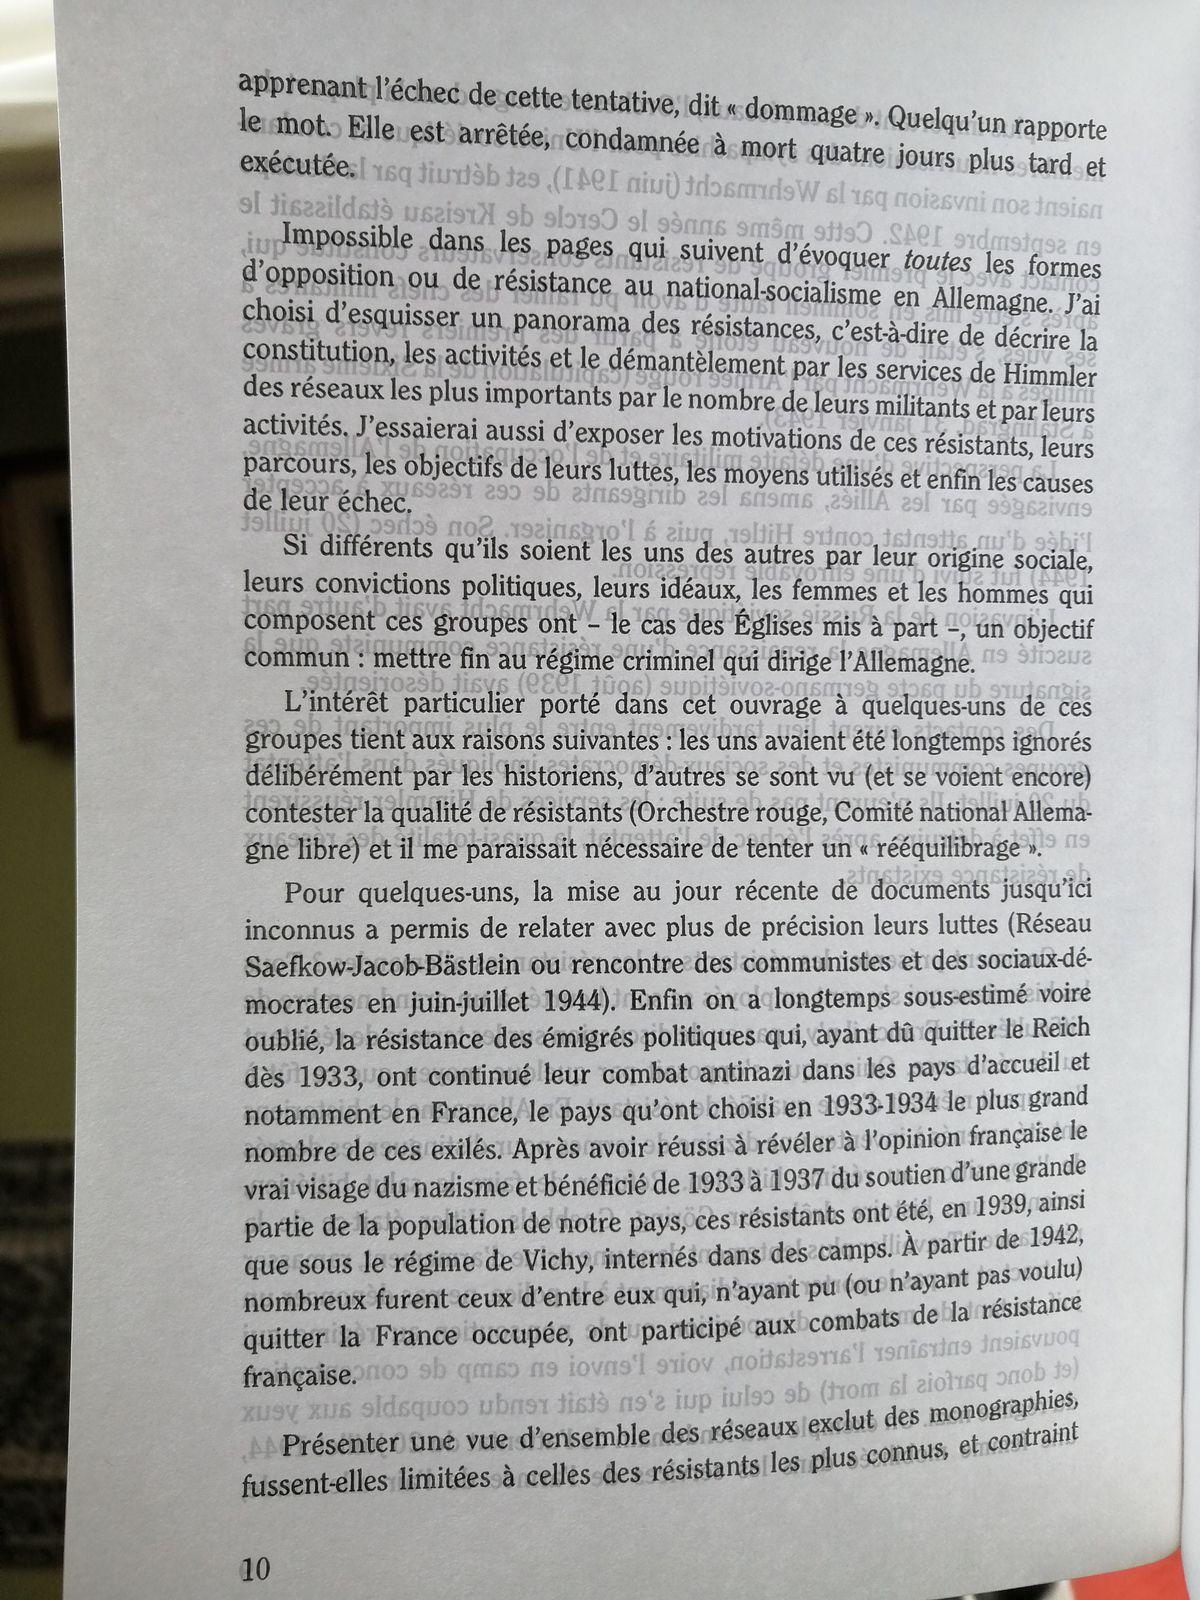 30-12-20- CES ALLEMANDS QUI RESISTERENT A HITLER (GILBERT BADIA VIA JACQUES ALLARD)